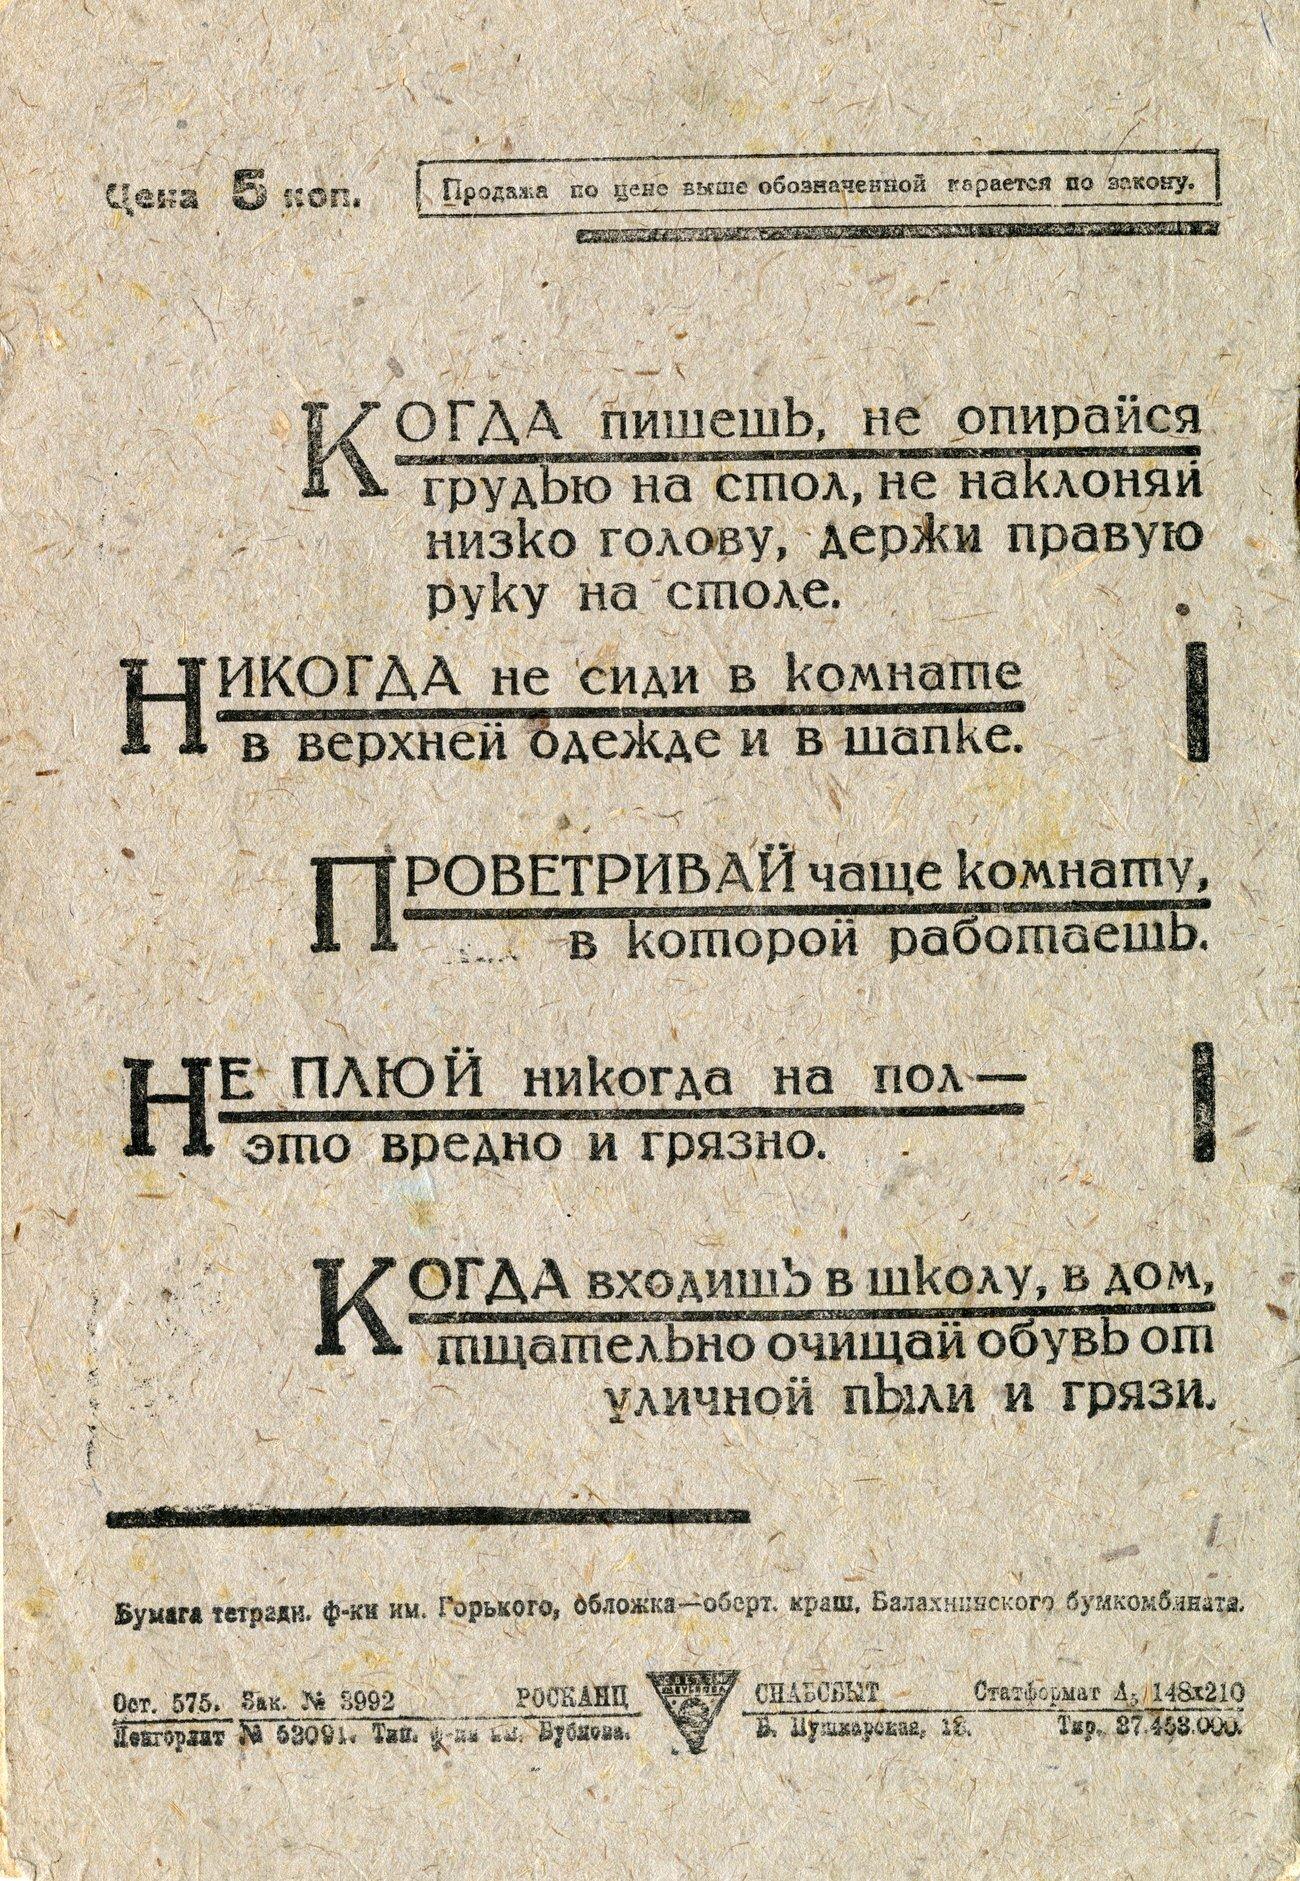 Ф-ка им. Горького обл. Балахнинский бумкомбинат, оборот